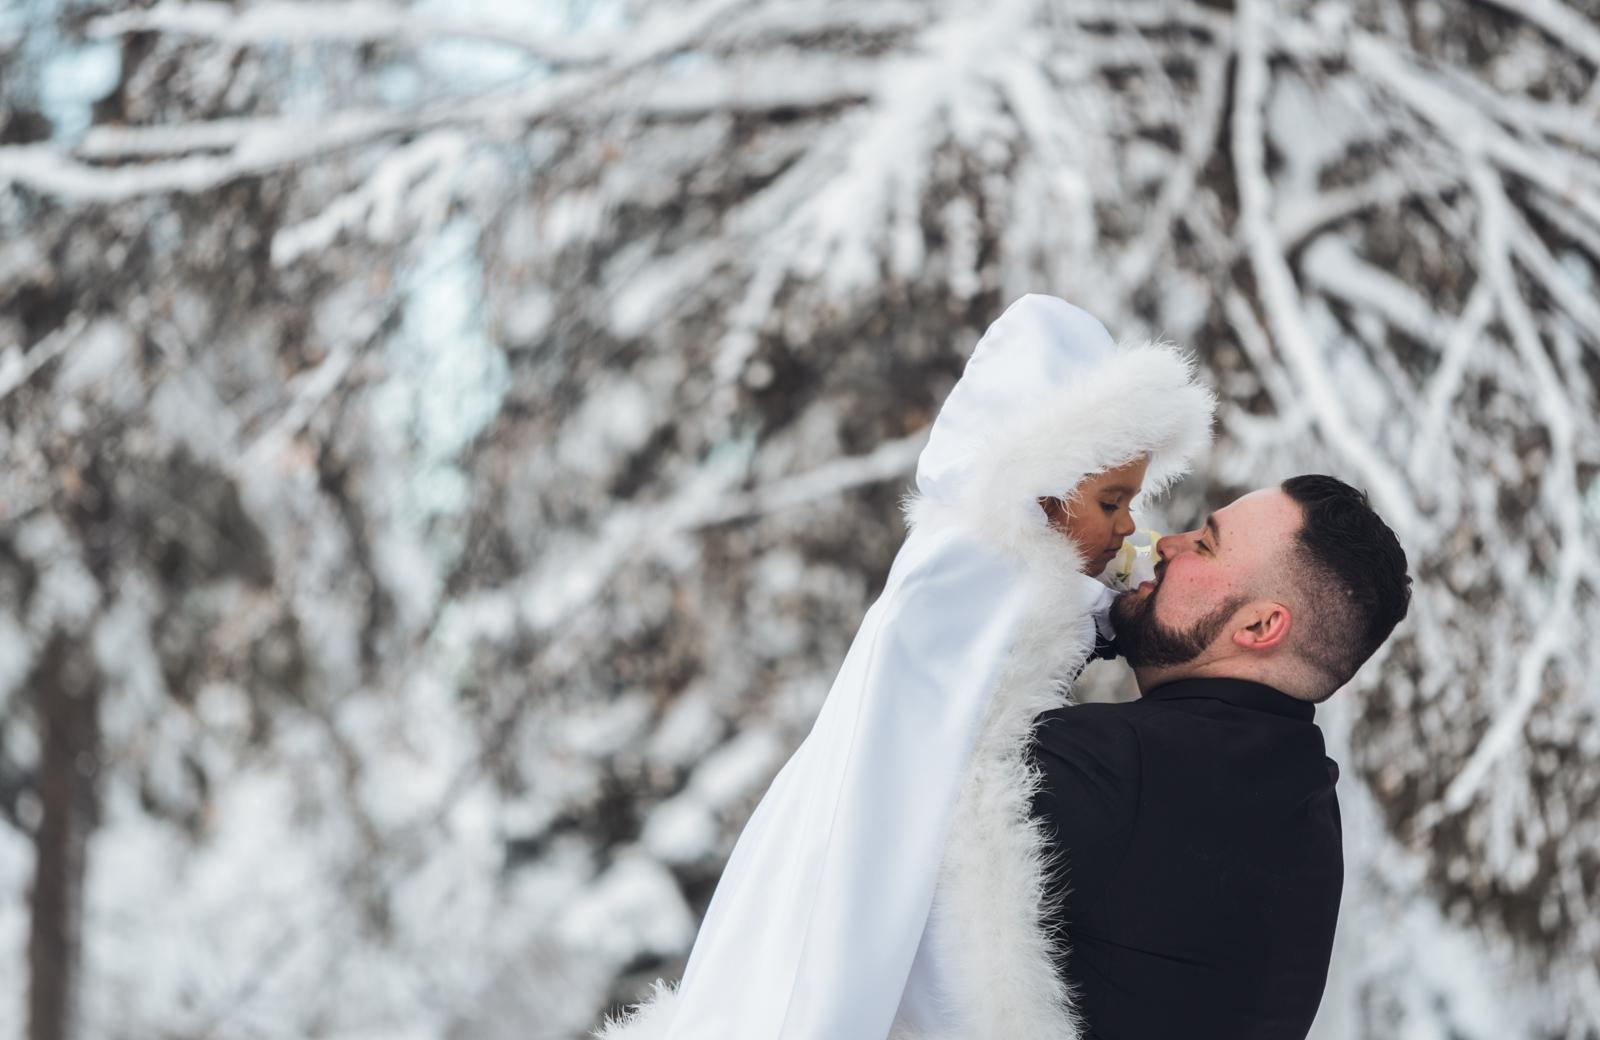 top-wedding-photos-2018-blog-91.jpg